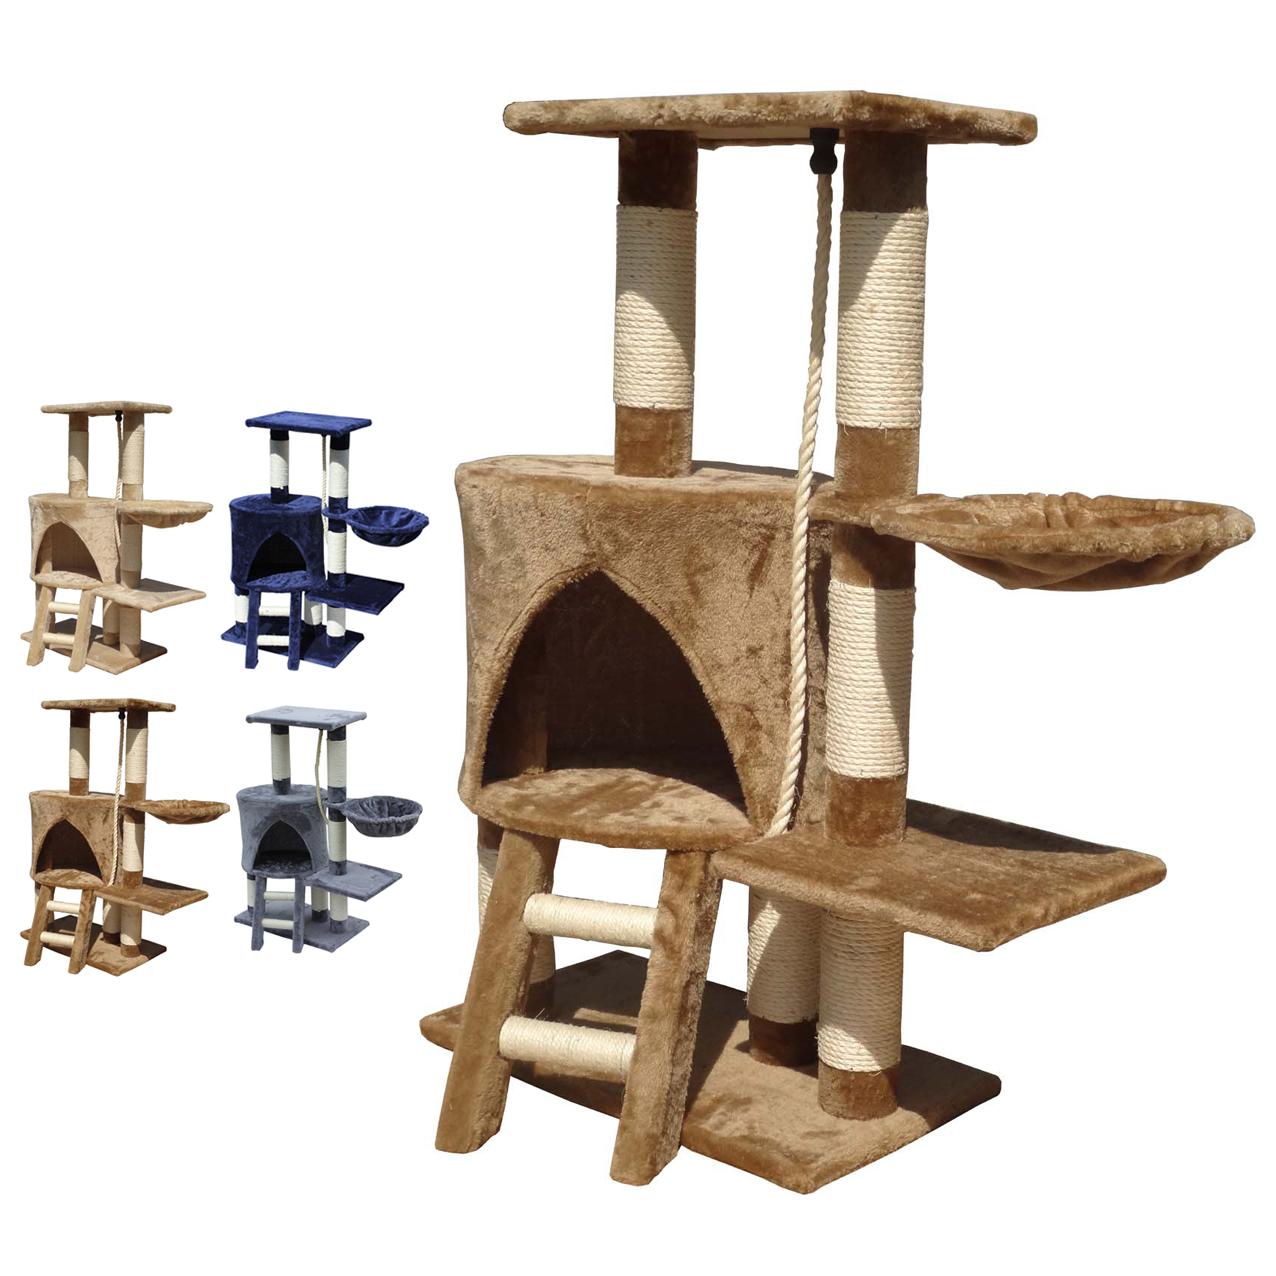 kitten cat tree scratcher scratching post sisal climbing toy activity centre bed ebay. Black Bedroom Furniture Sets. Home Design Ideas